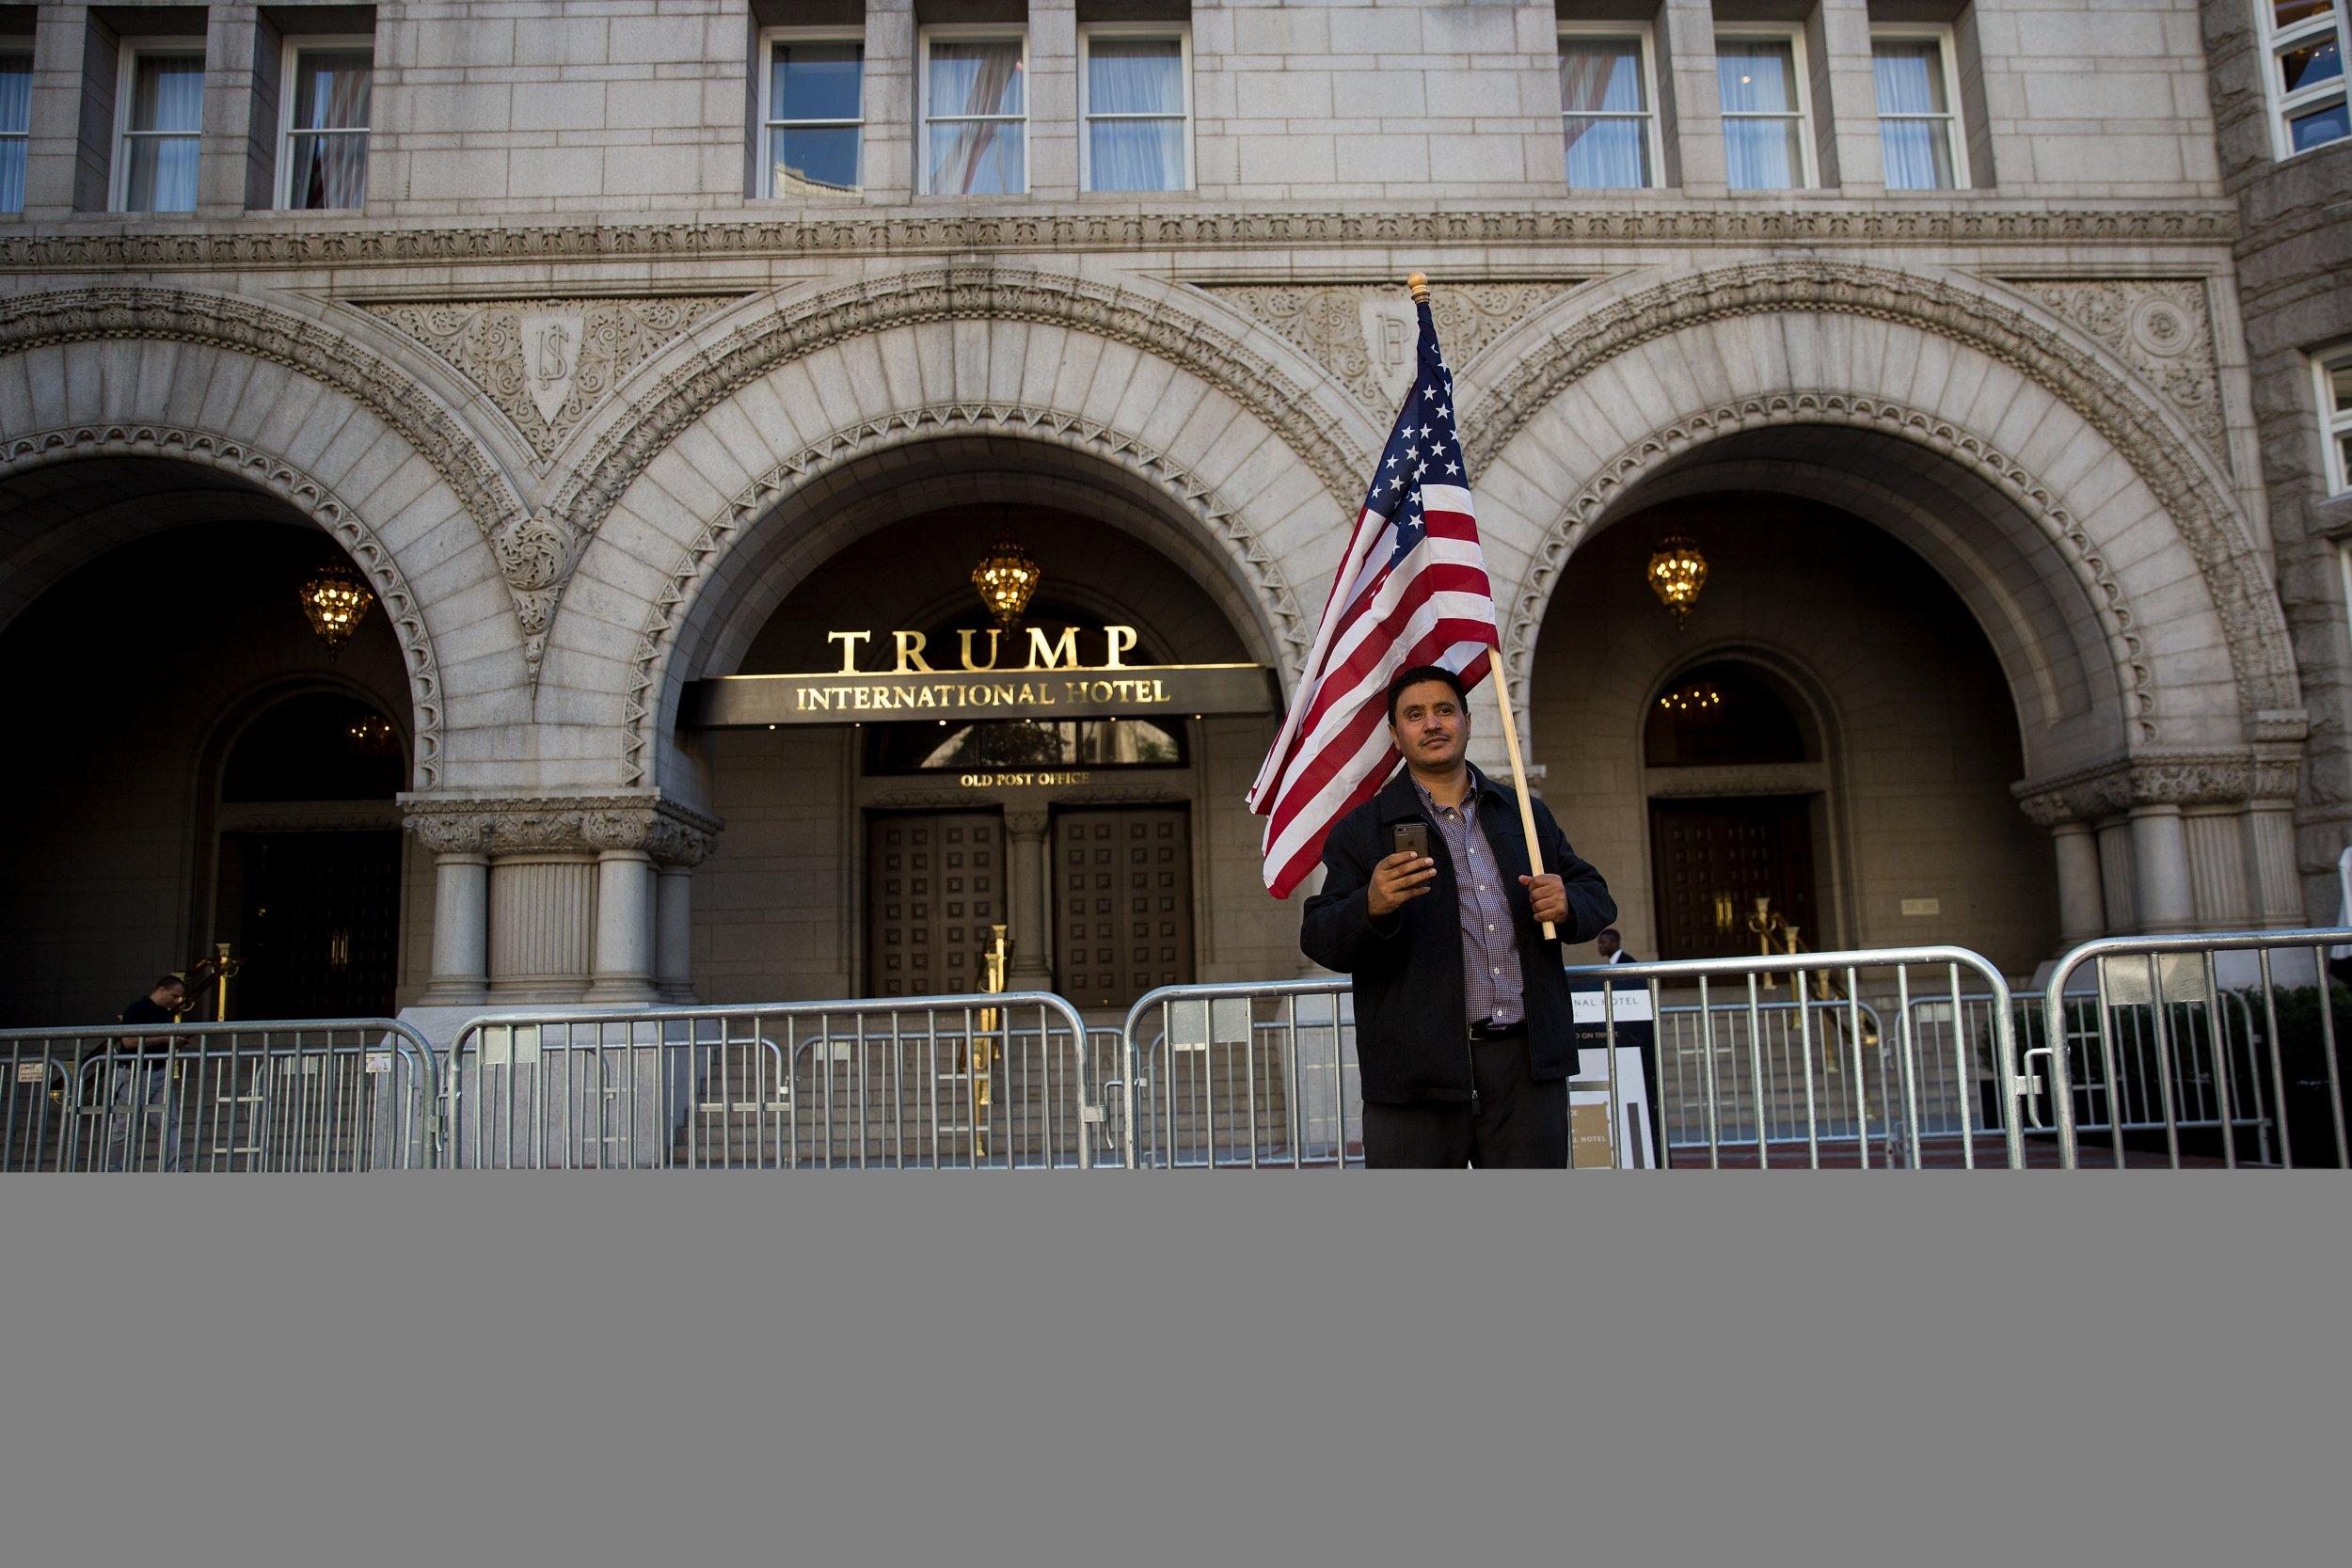 Trump Hotel Washington DC